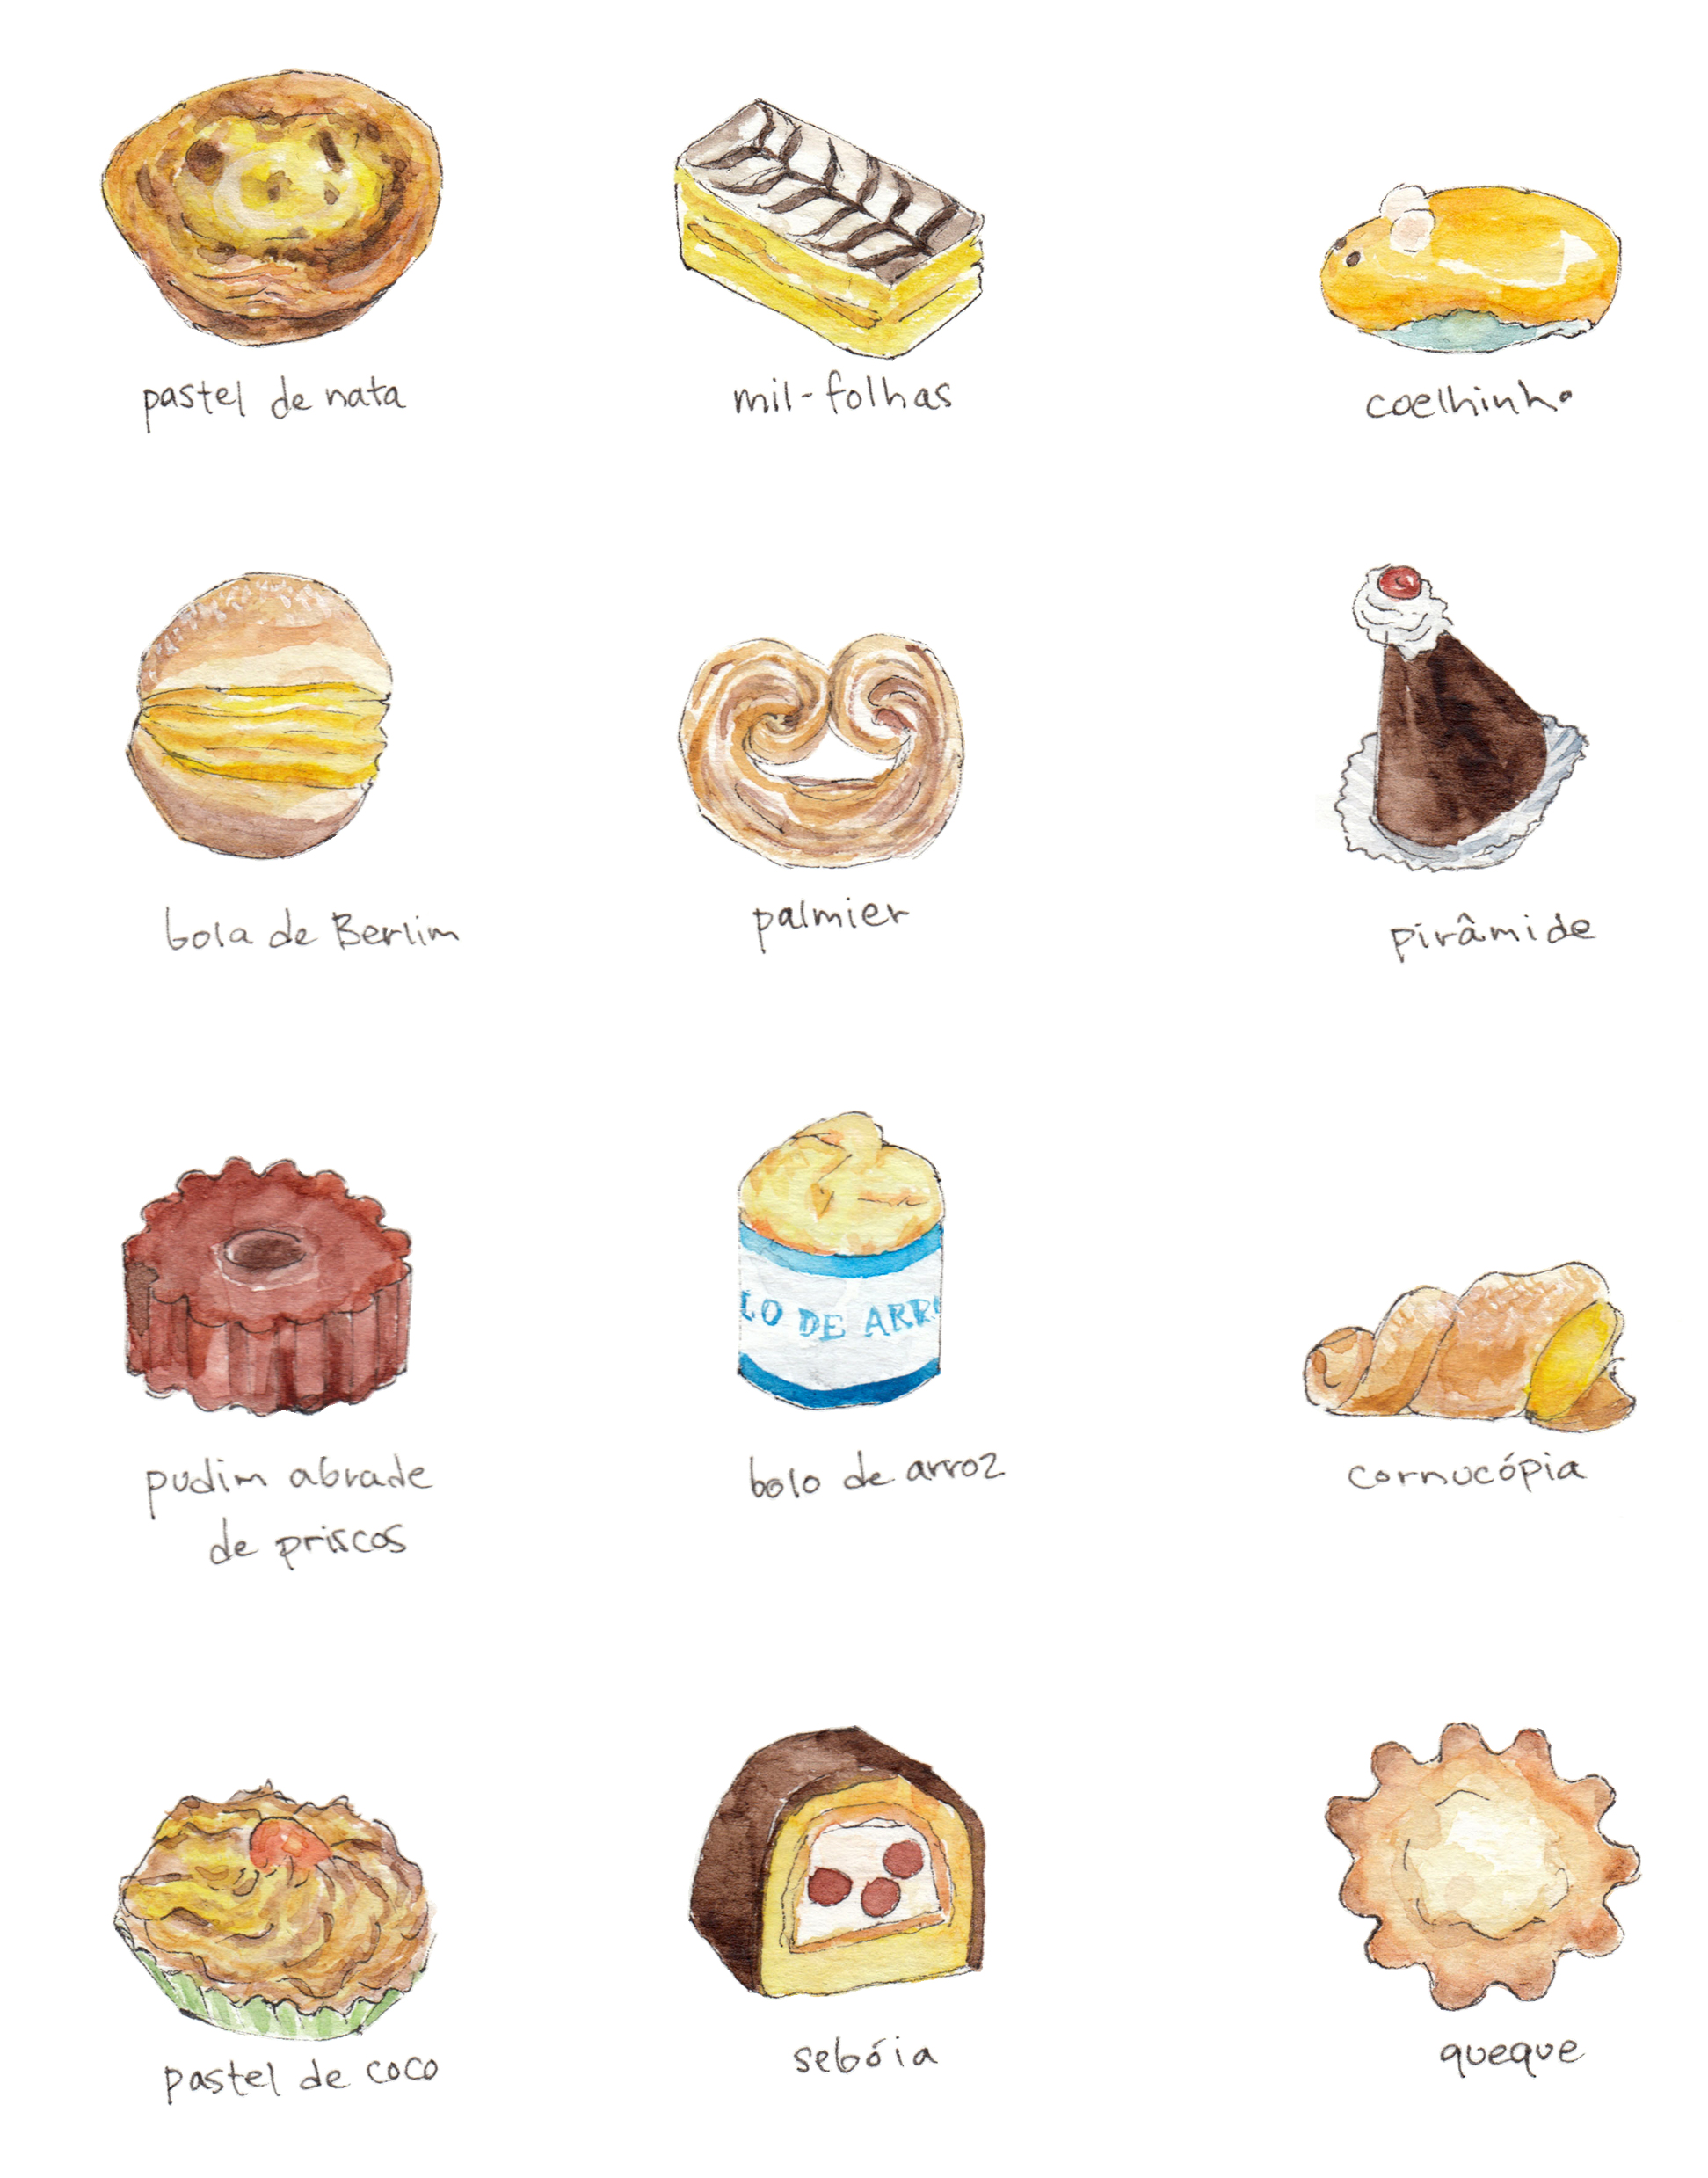 Portuguese pastries food illustration